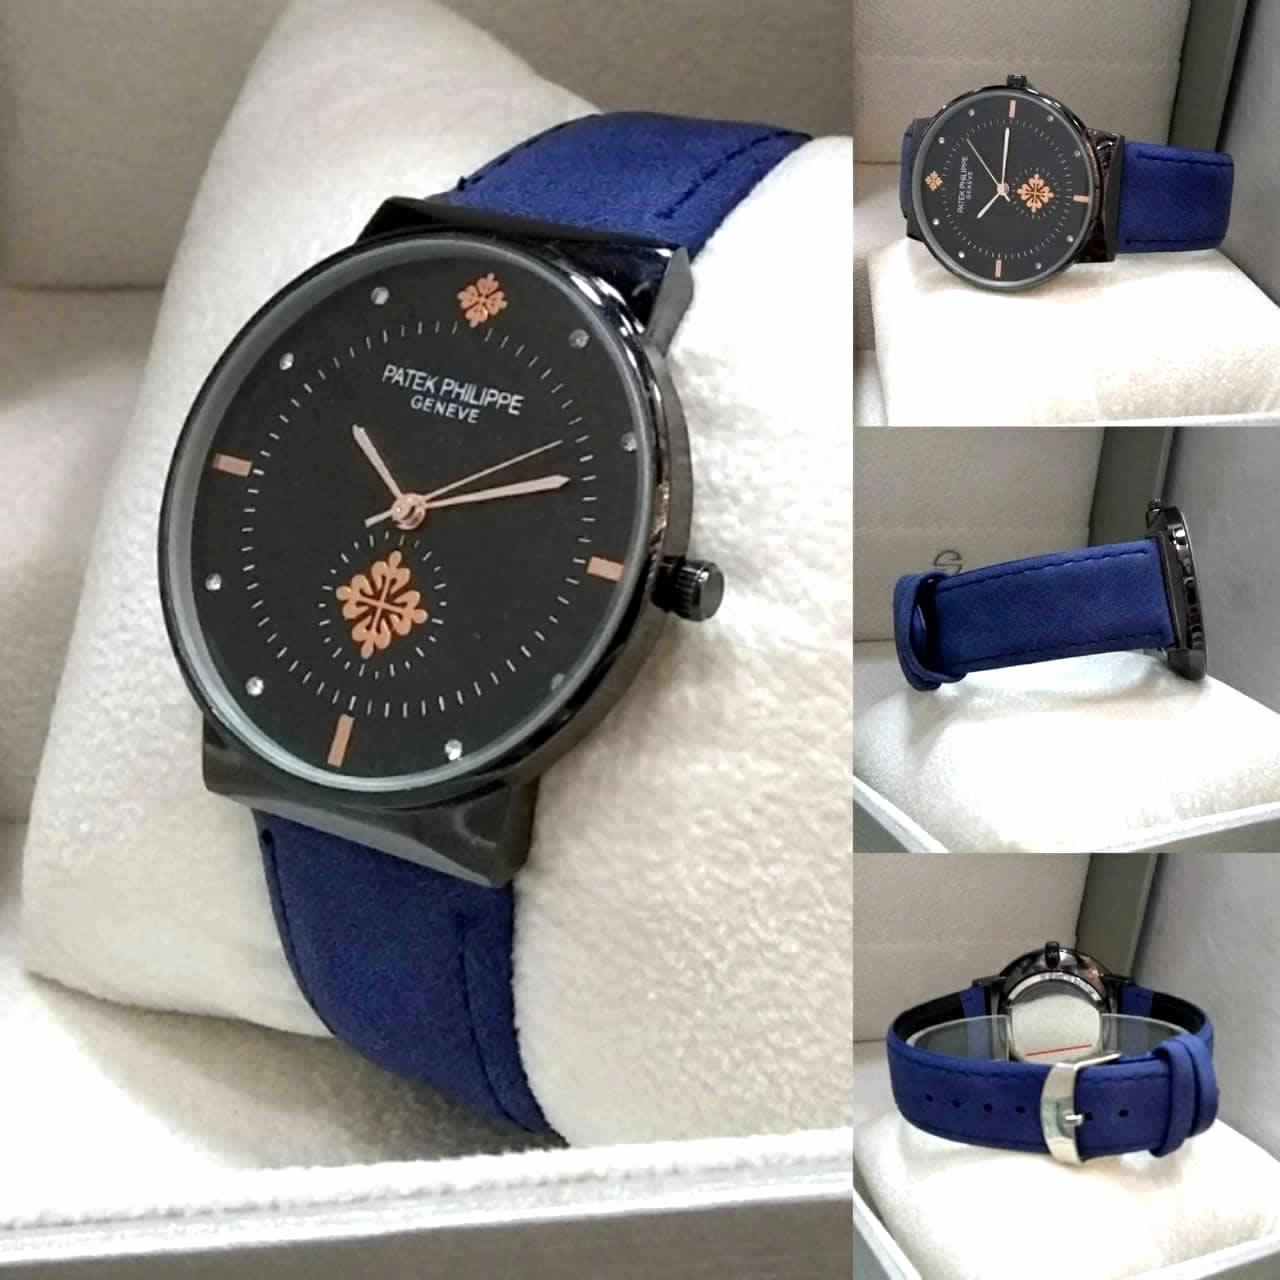 Men Watch & Women Watch, Blue Leather Strap Stylish Watch